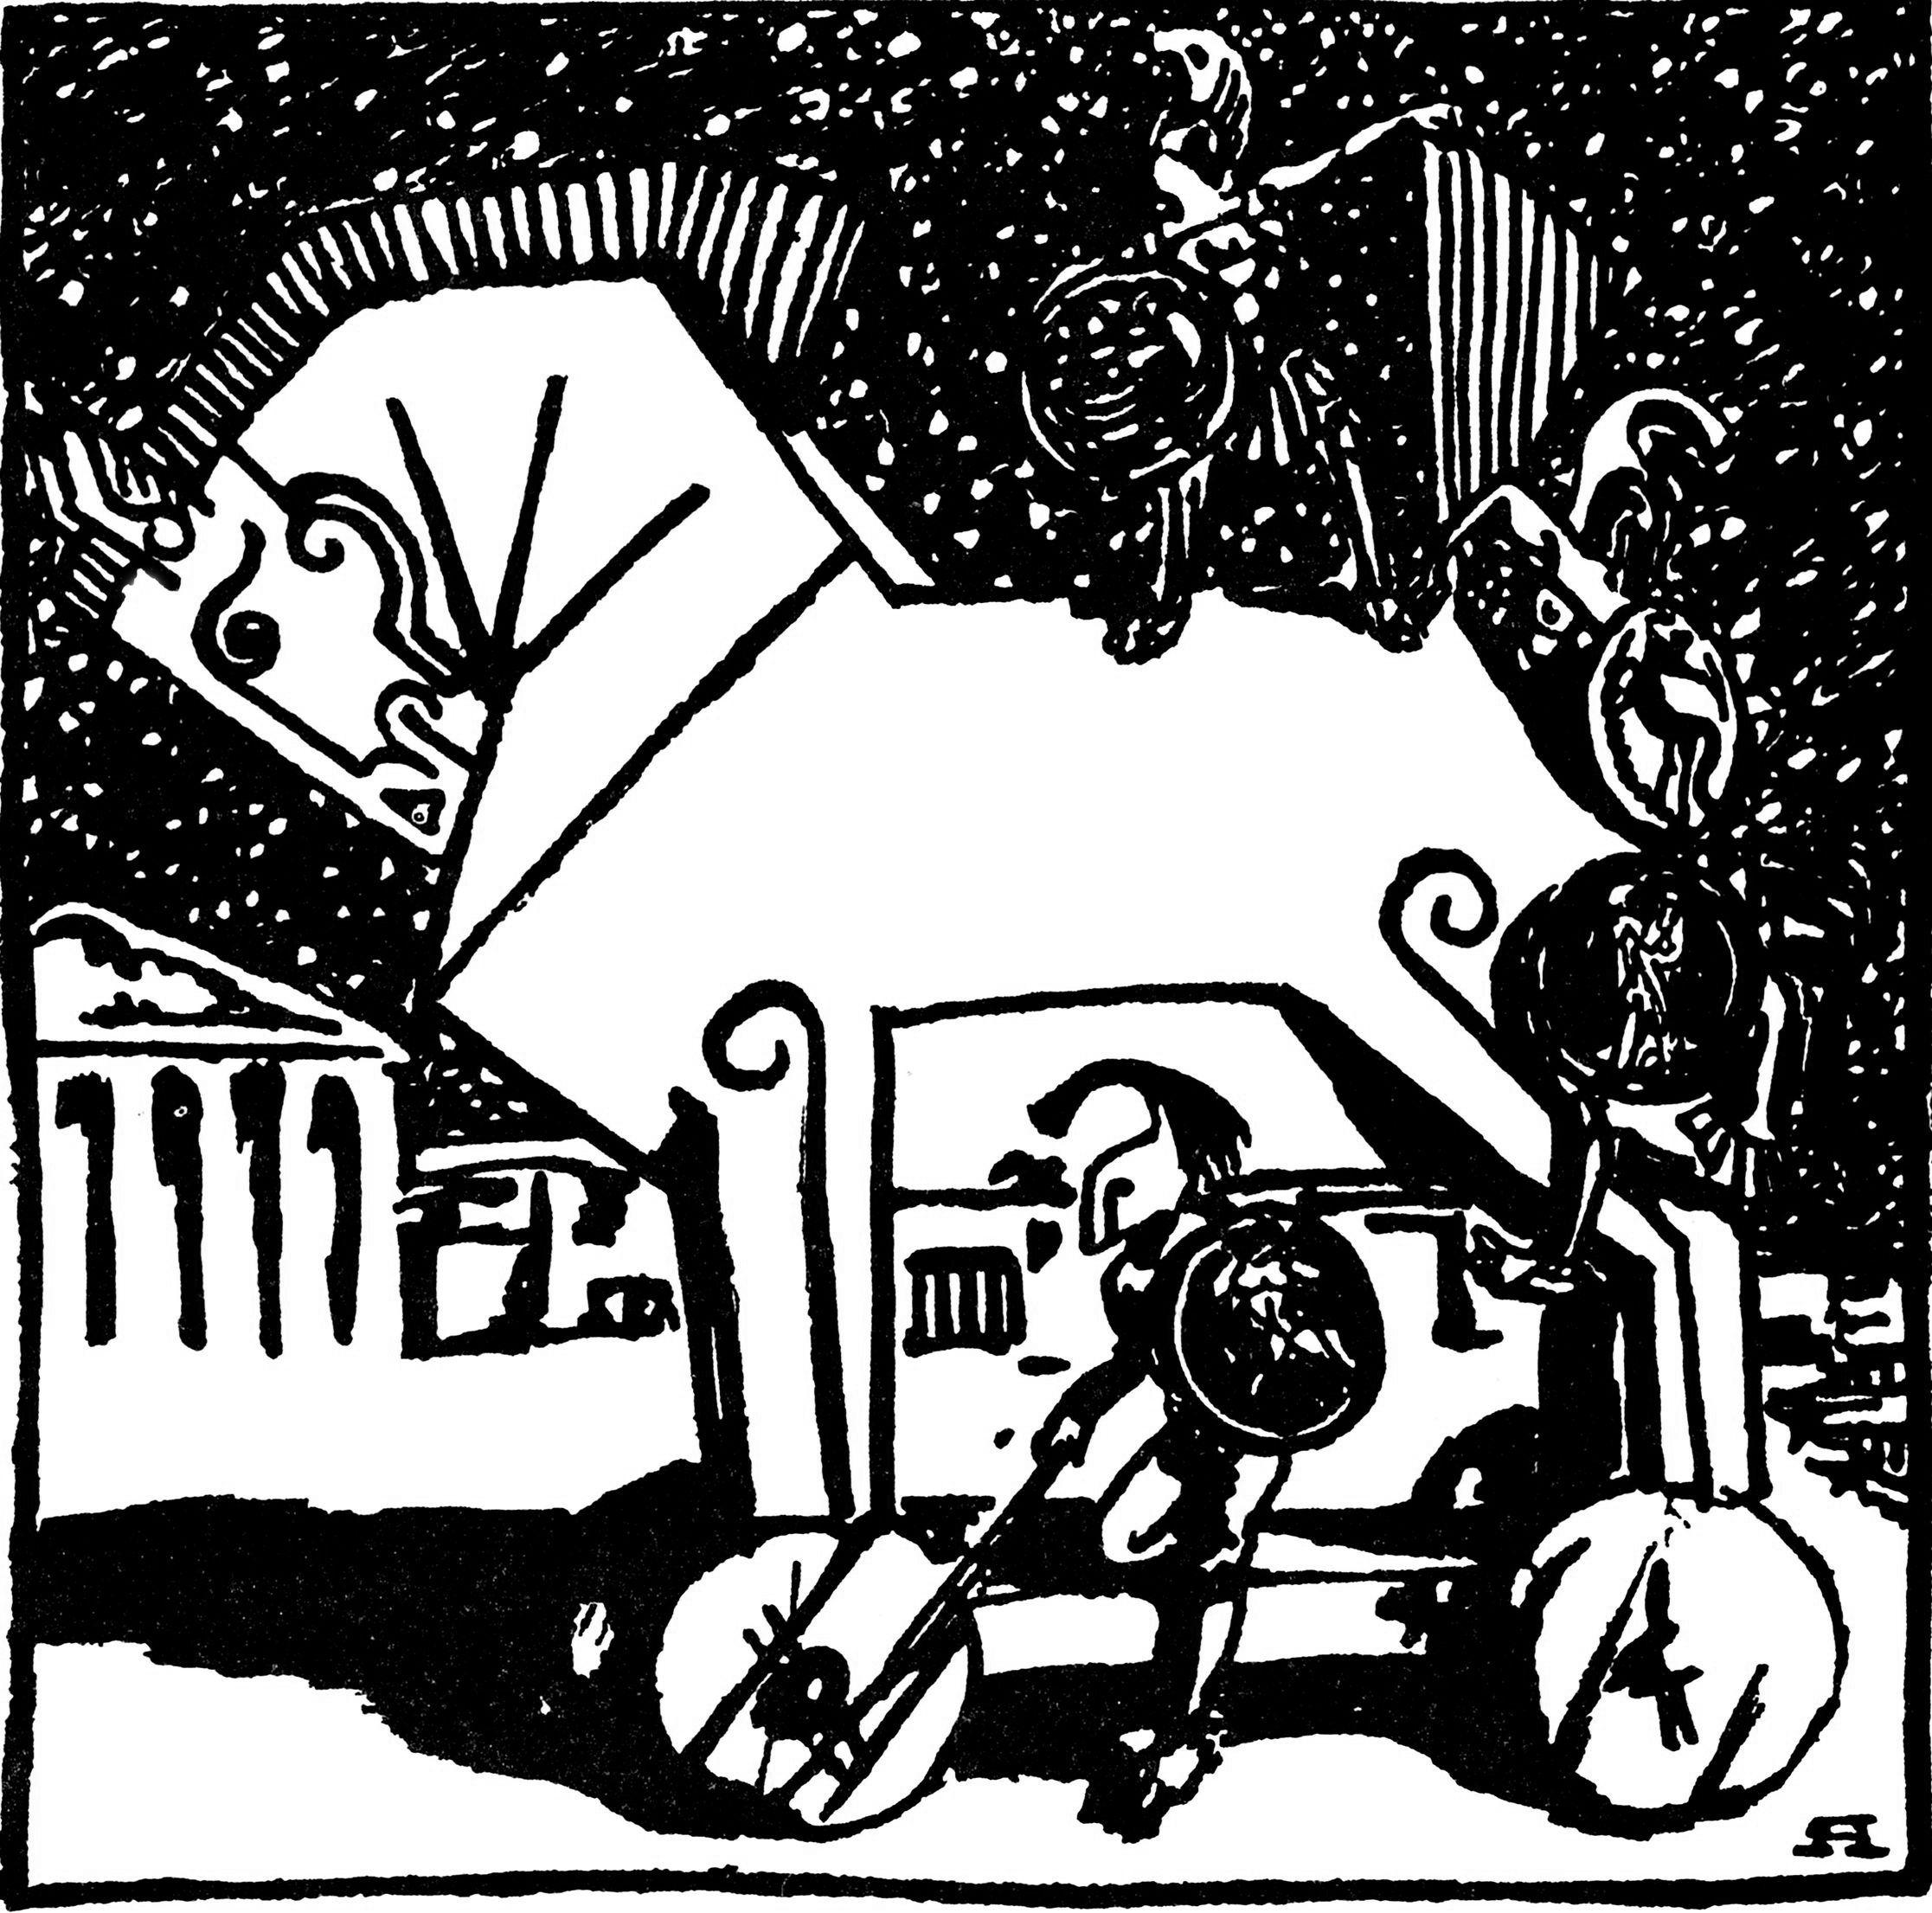 File:Trojan Horse by A Yakovlev 1911.jpg - Wikimedia Commons